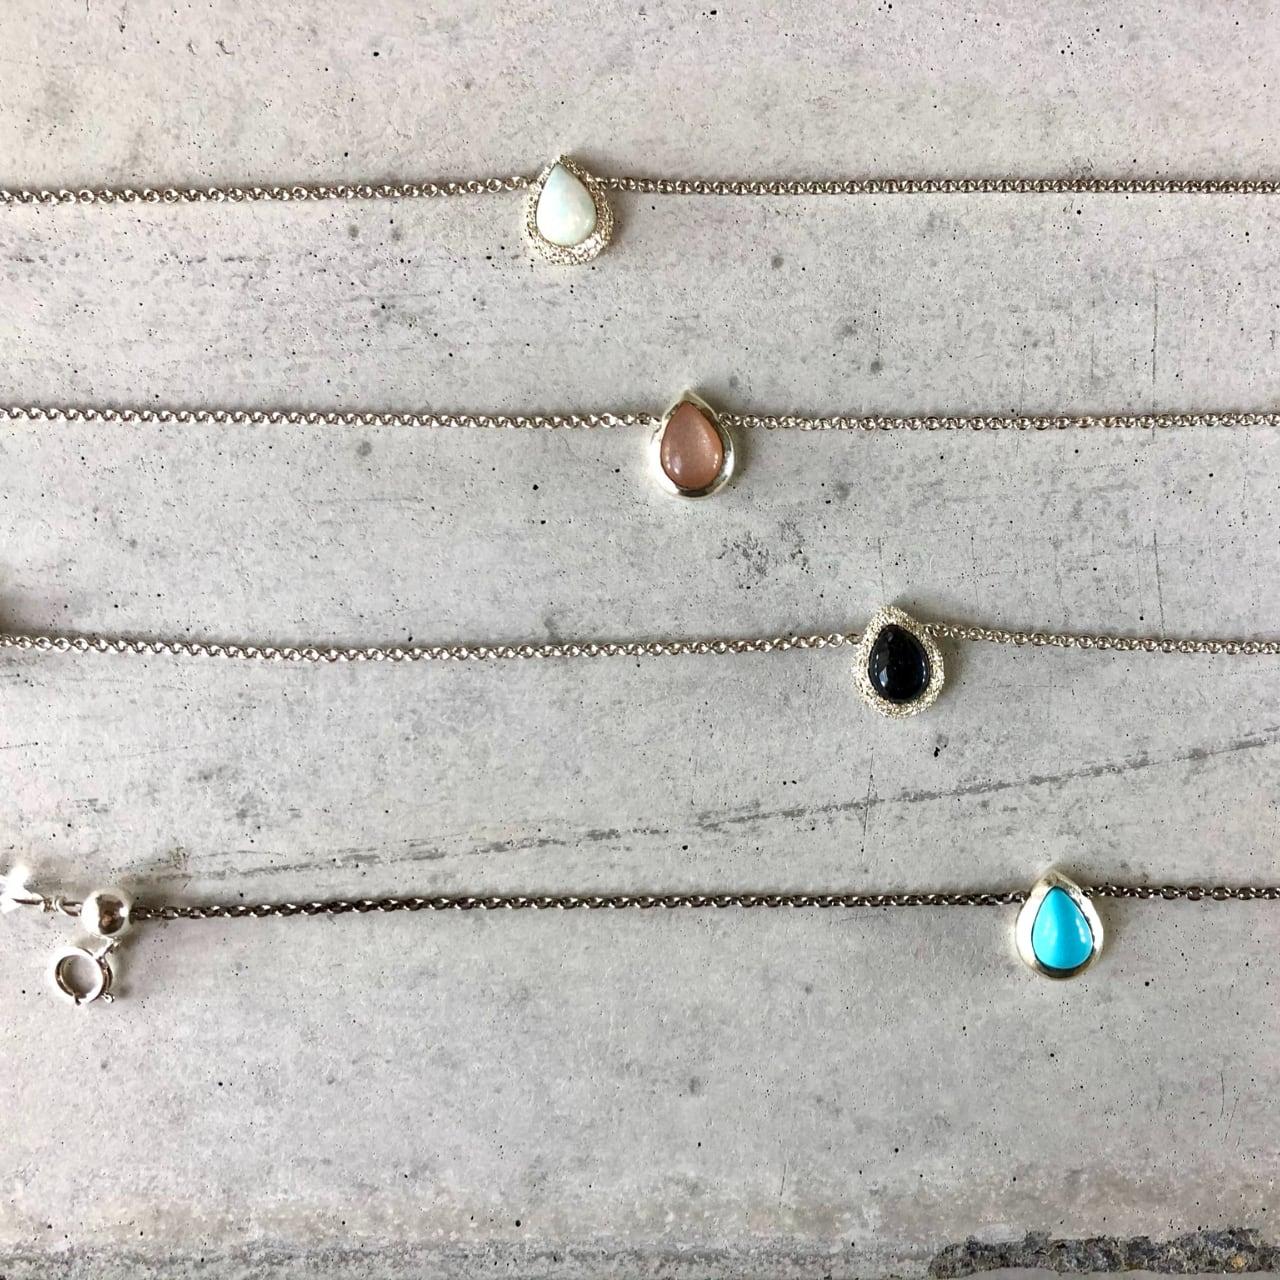 【LB-4SV】Pair shape natural stone chain bracelet  A/ターコイズ B/ピーチムーンストーン C/エヒオピアンオパール D/スペクトロライト